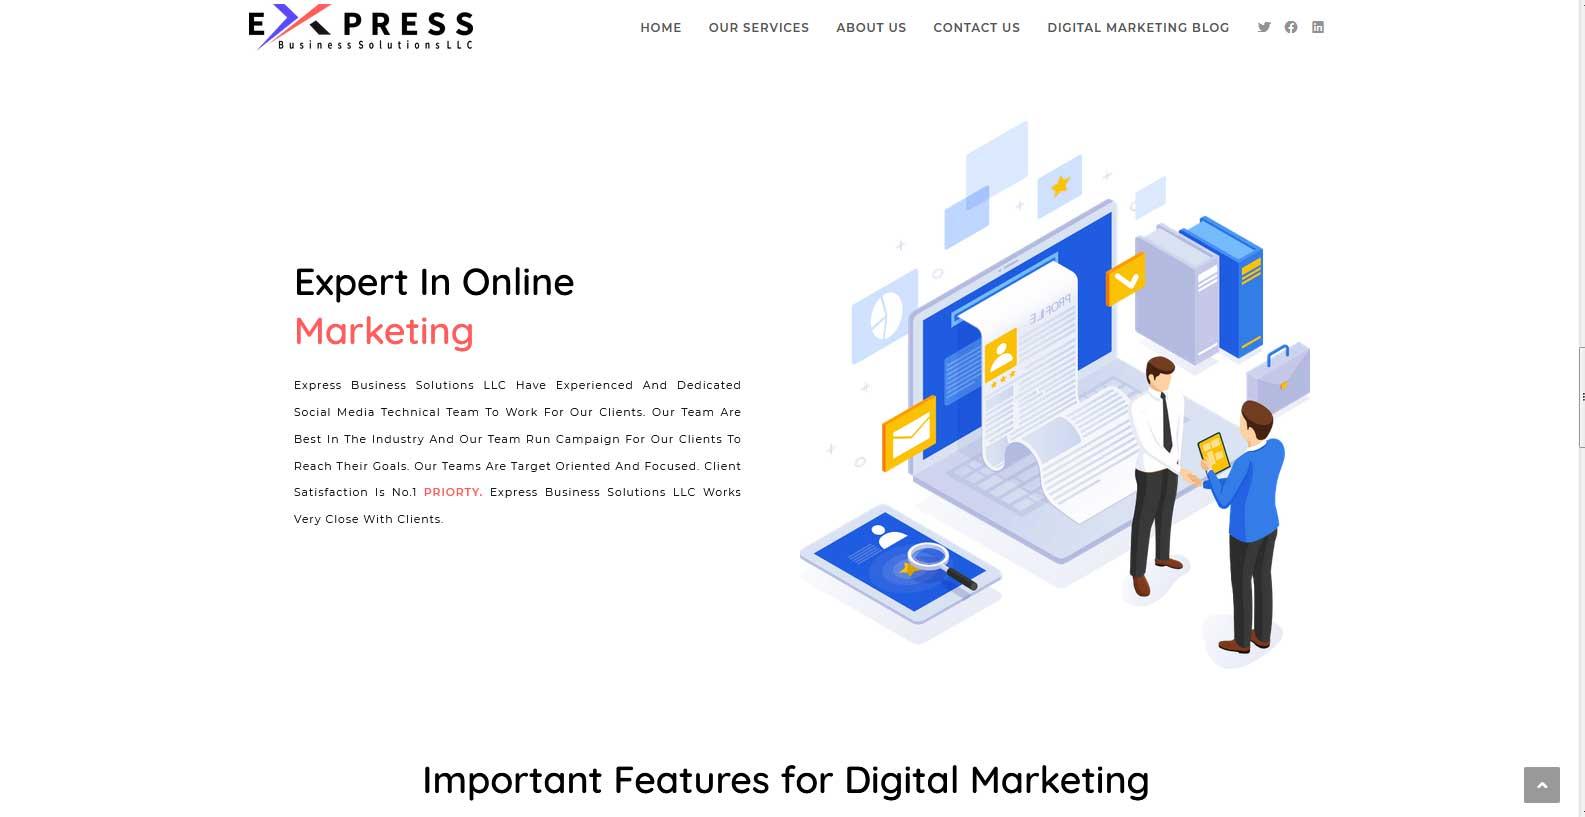 express-biz-sol-expert-in-online-marketing